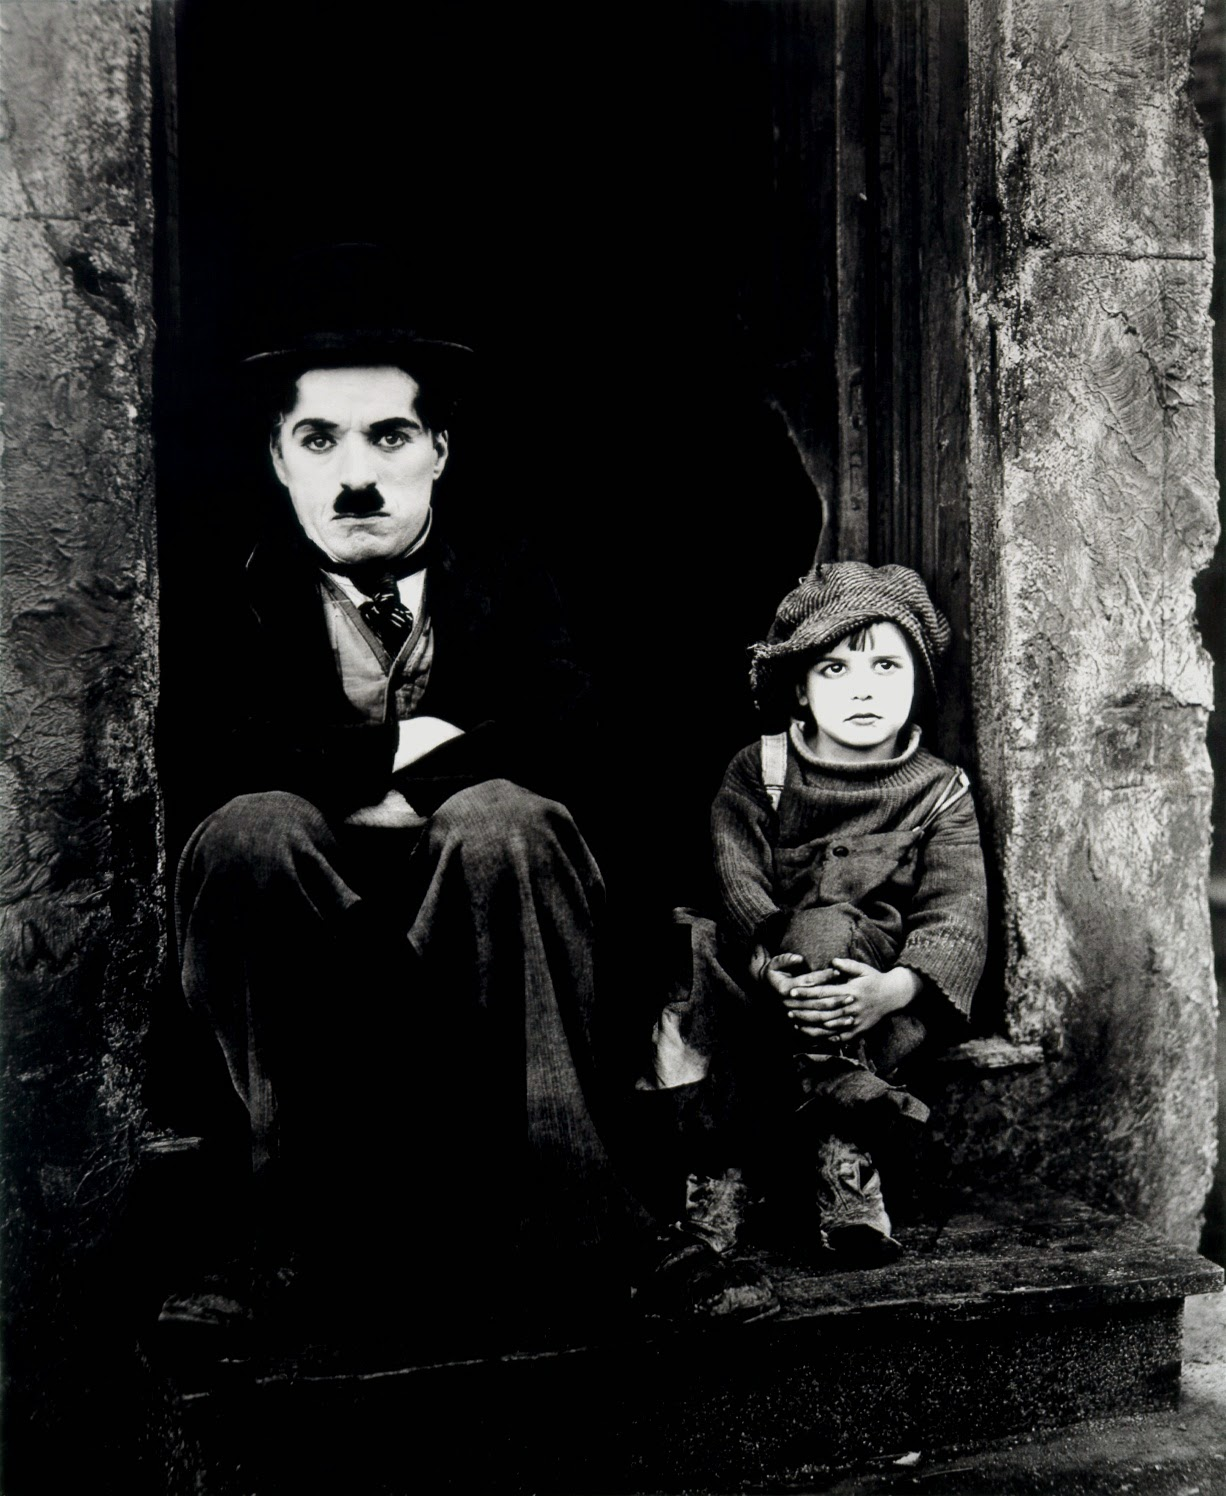 Chaplin, The Kid